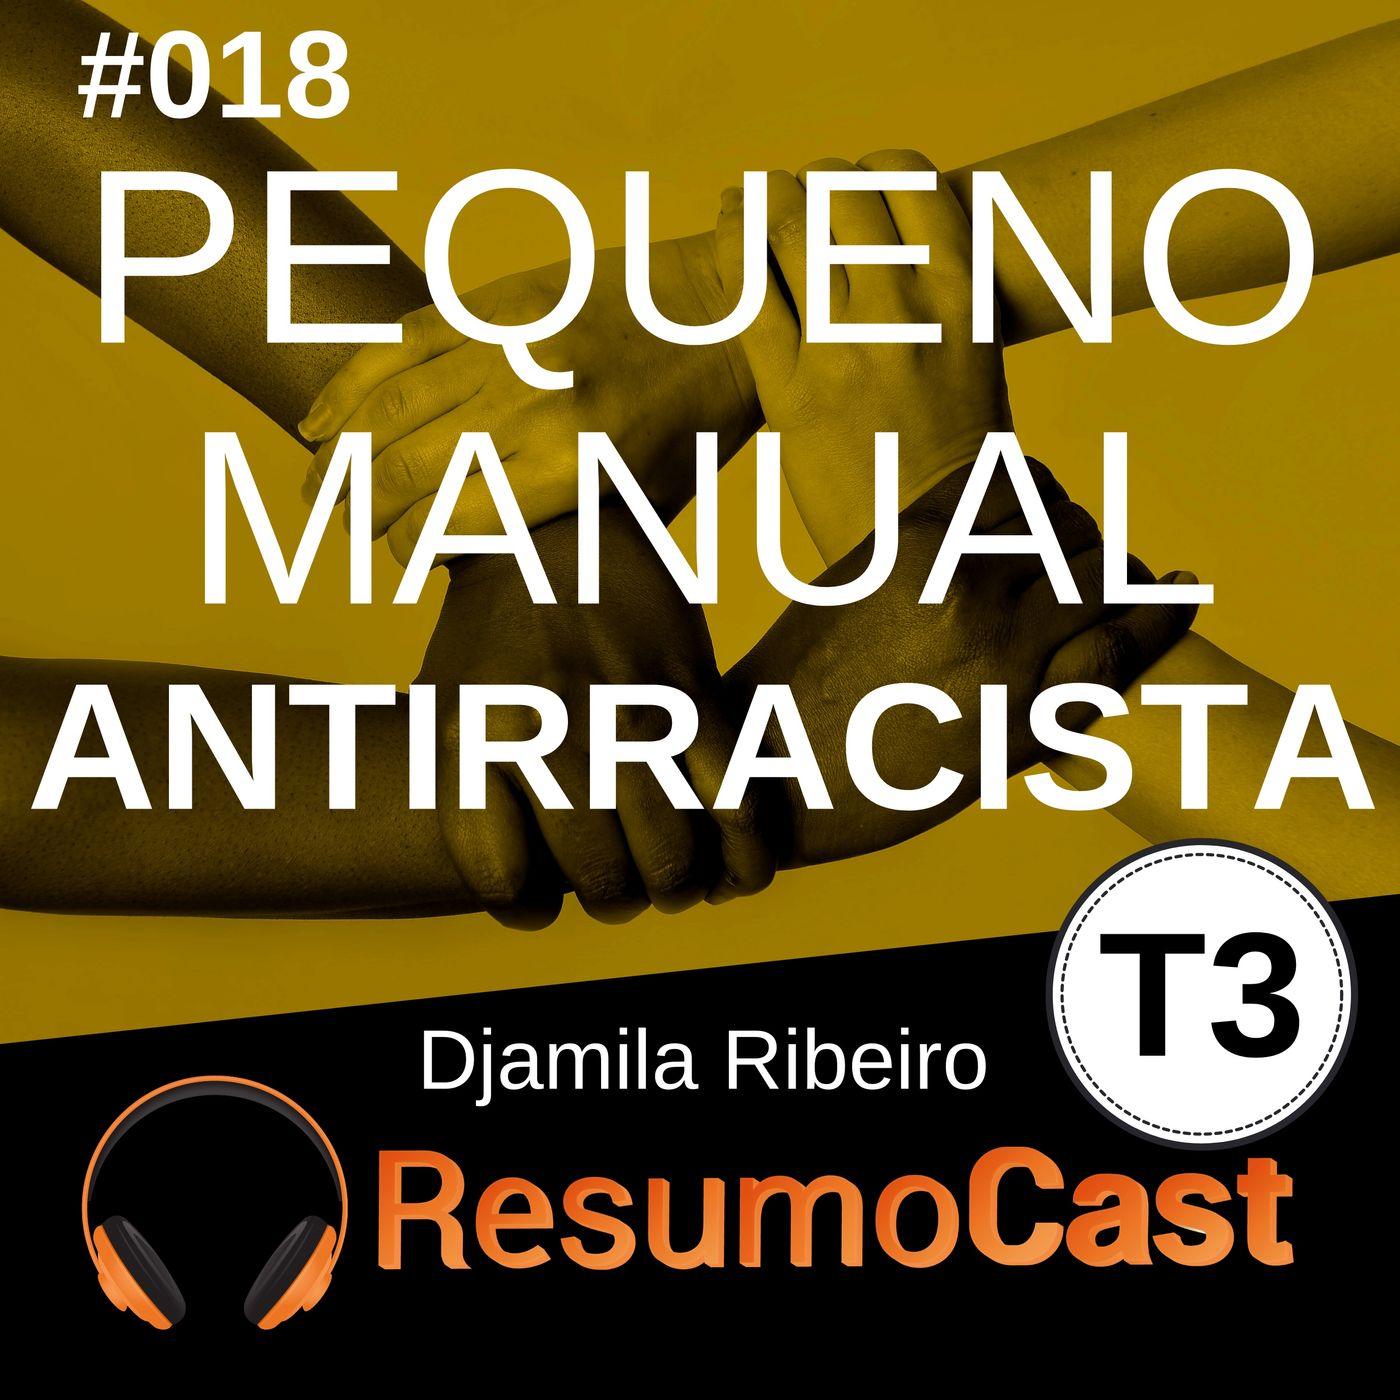 T3#018 Pequeno manual antirracista   Djamila Ribeiro